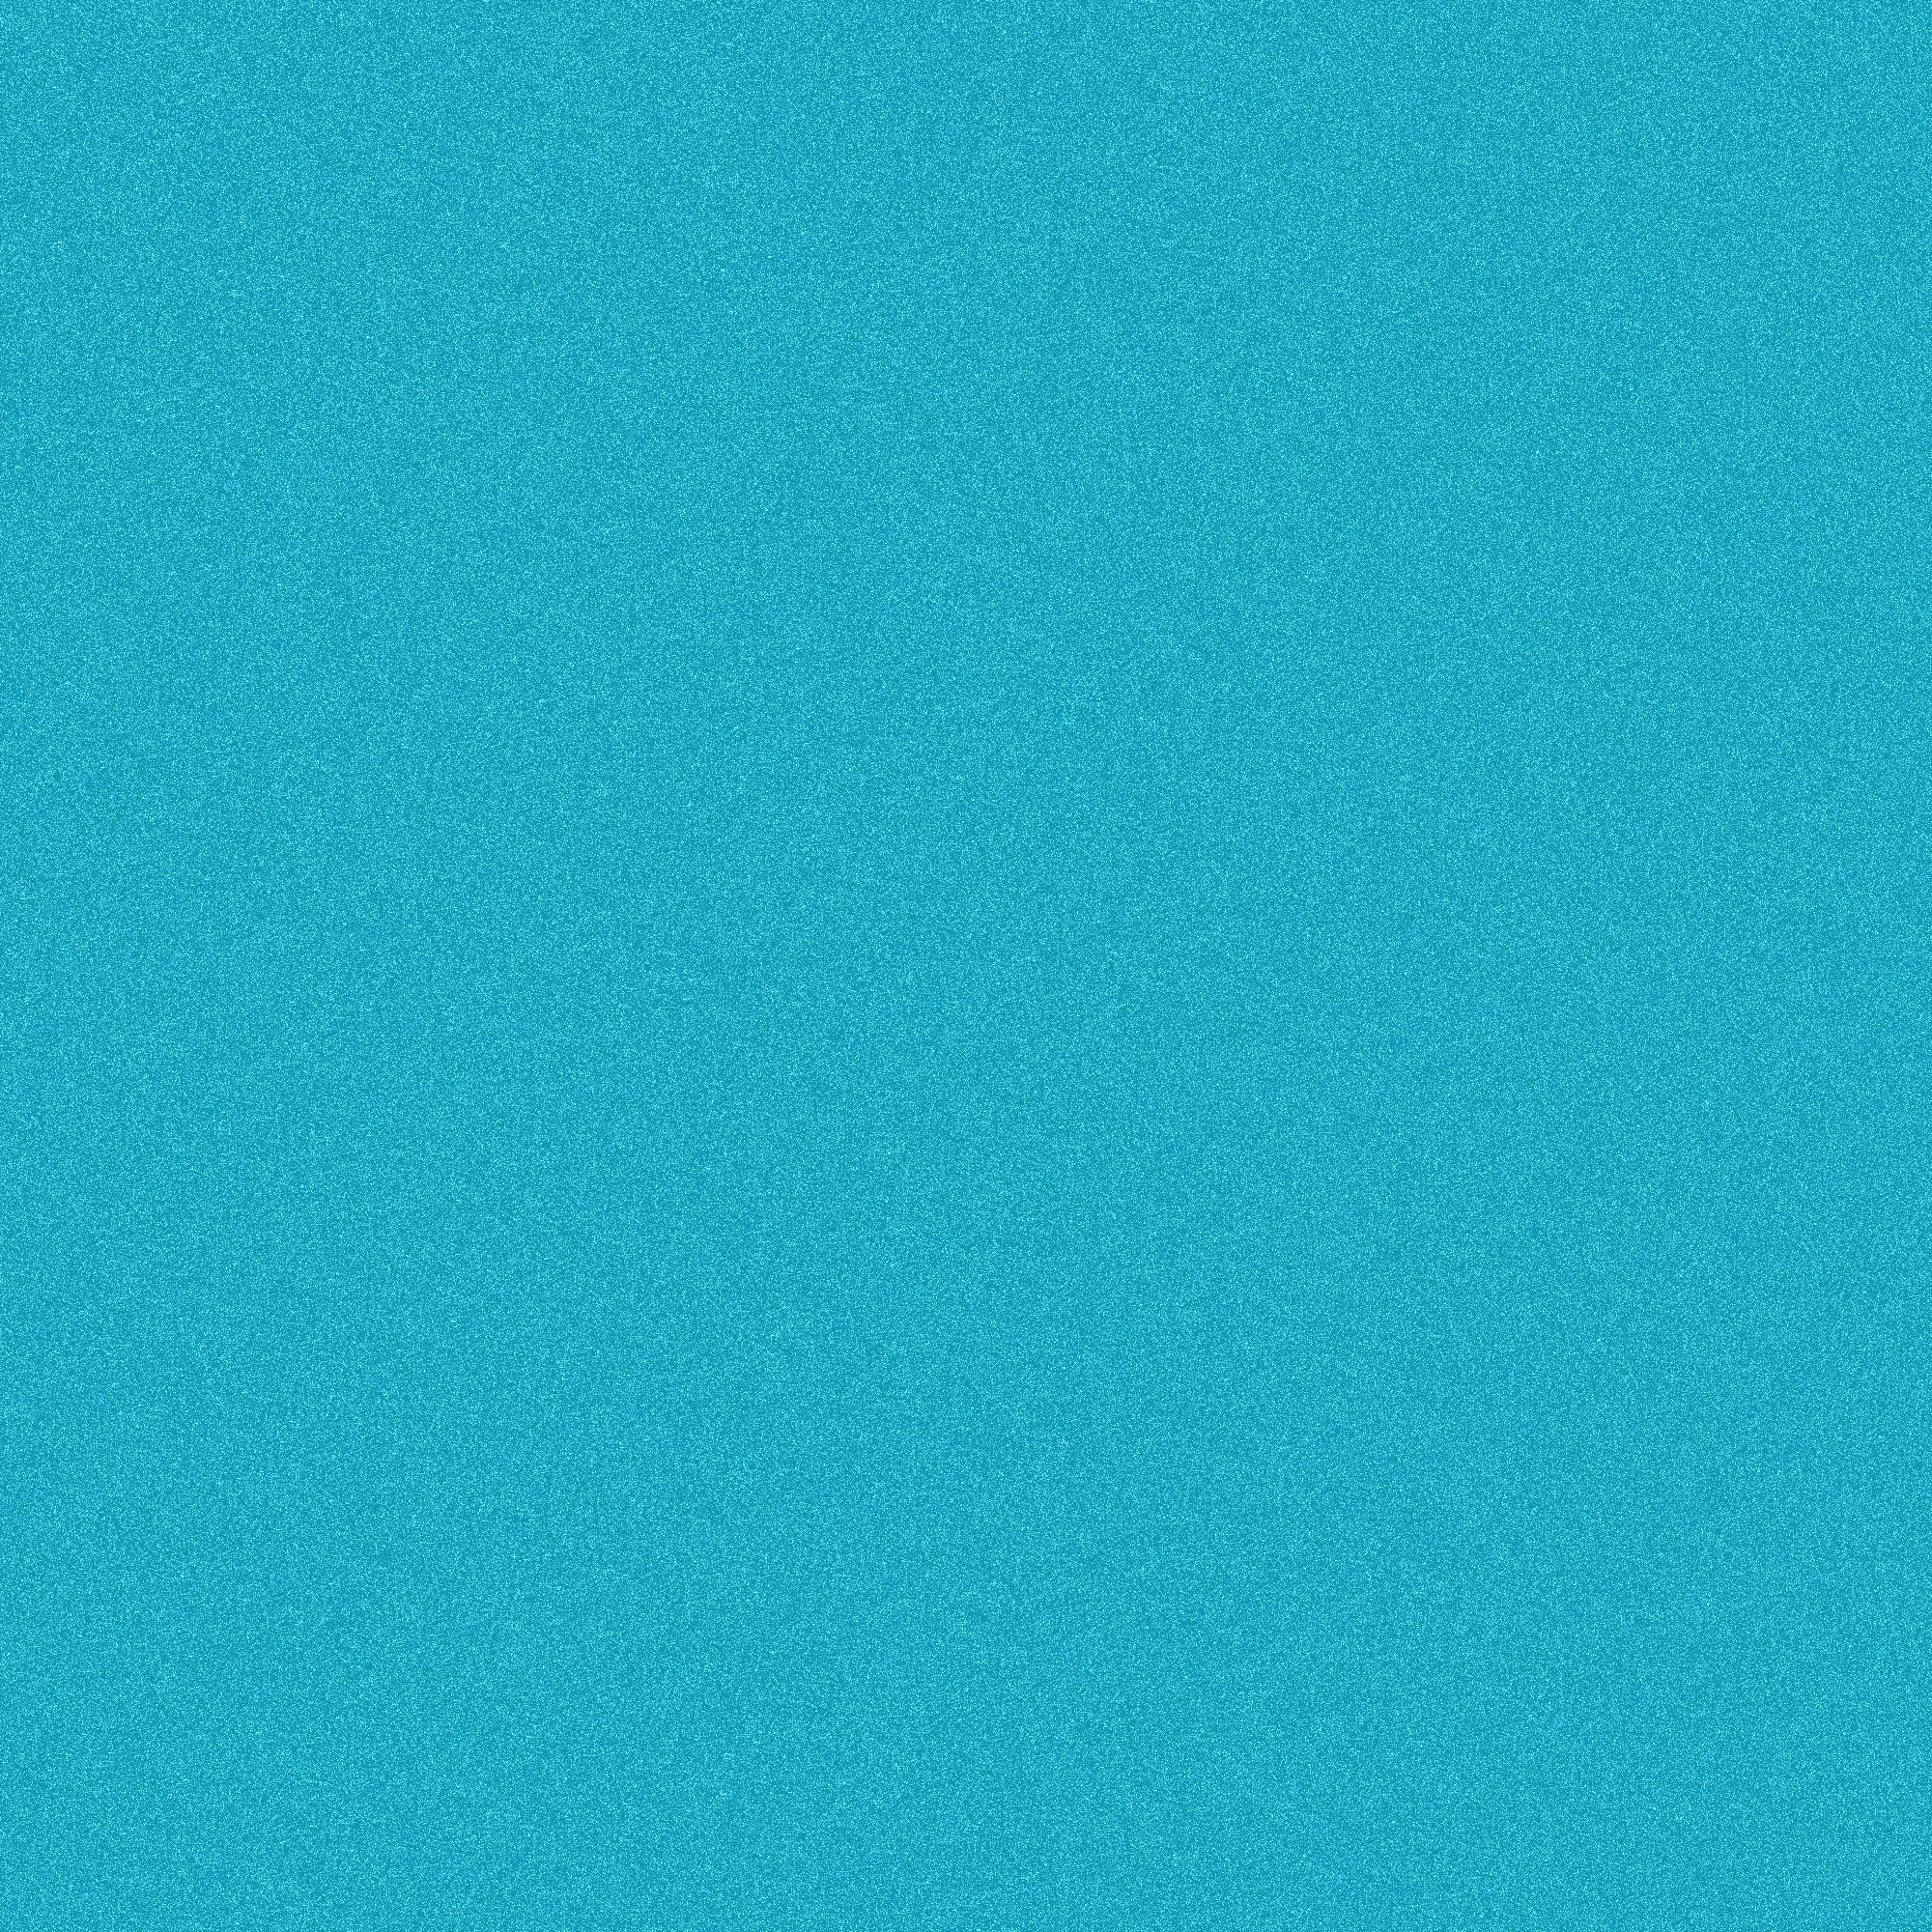 noize_background_lightblue